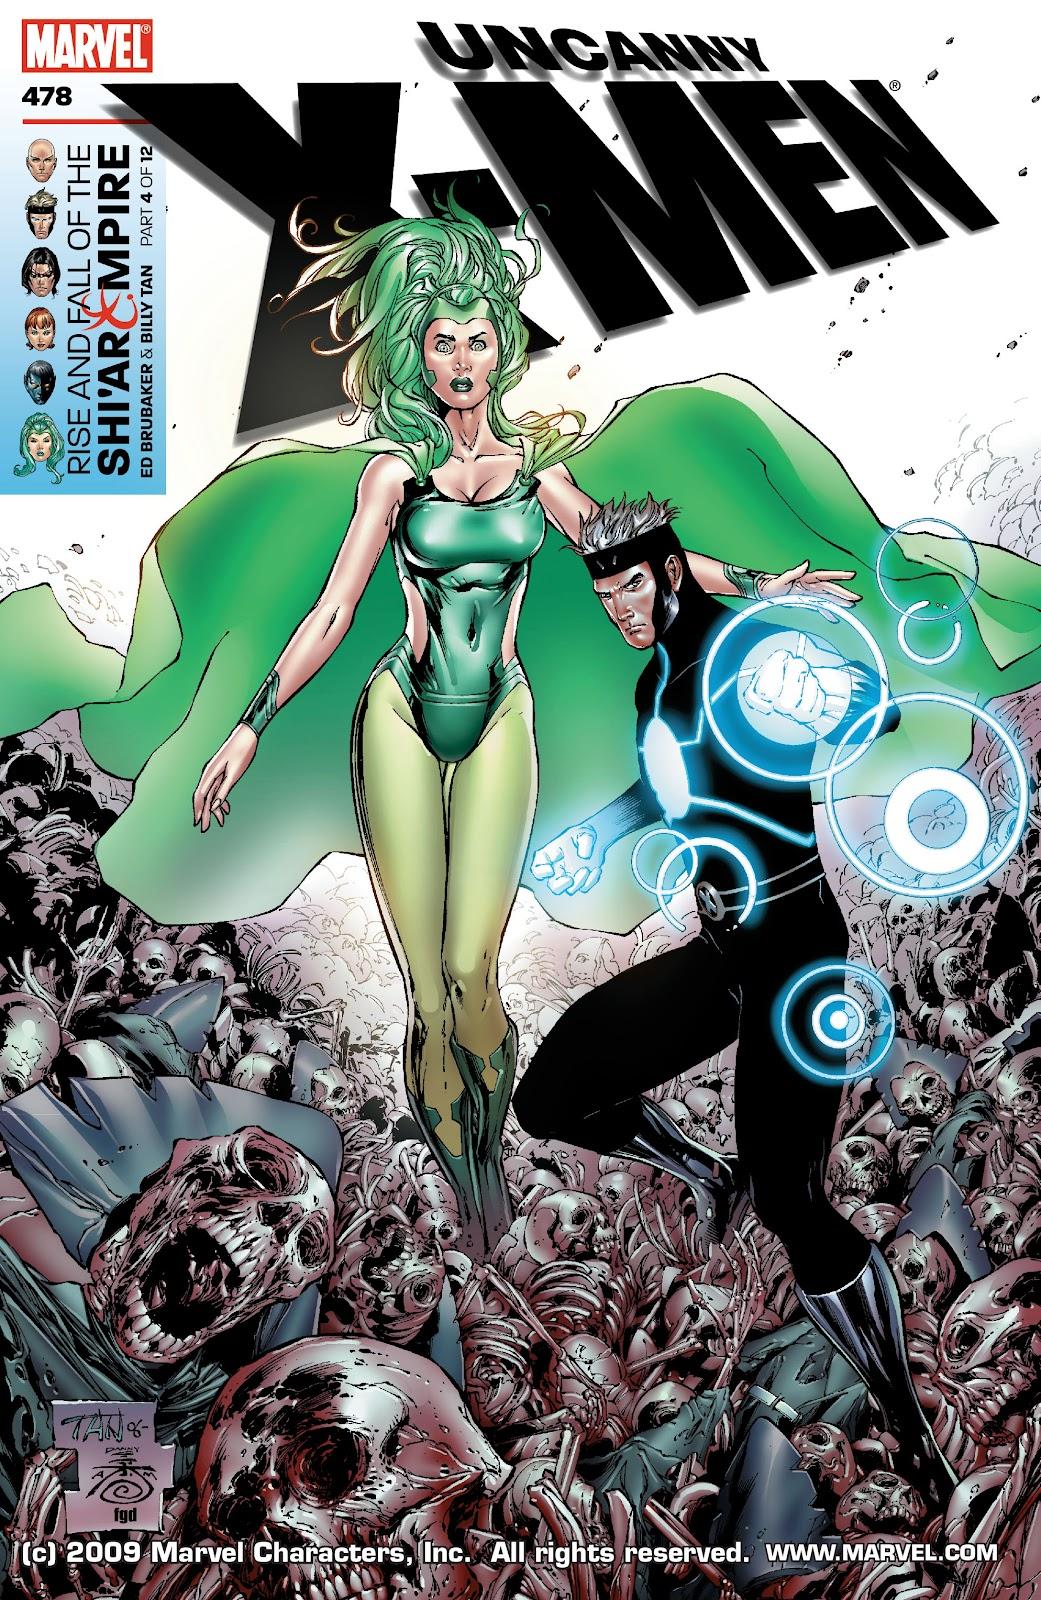 Uncanny X-Men (1963) issue 478 - Page 1